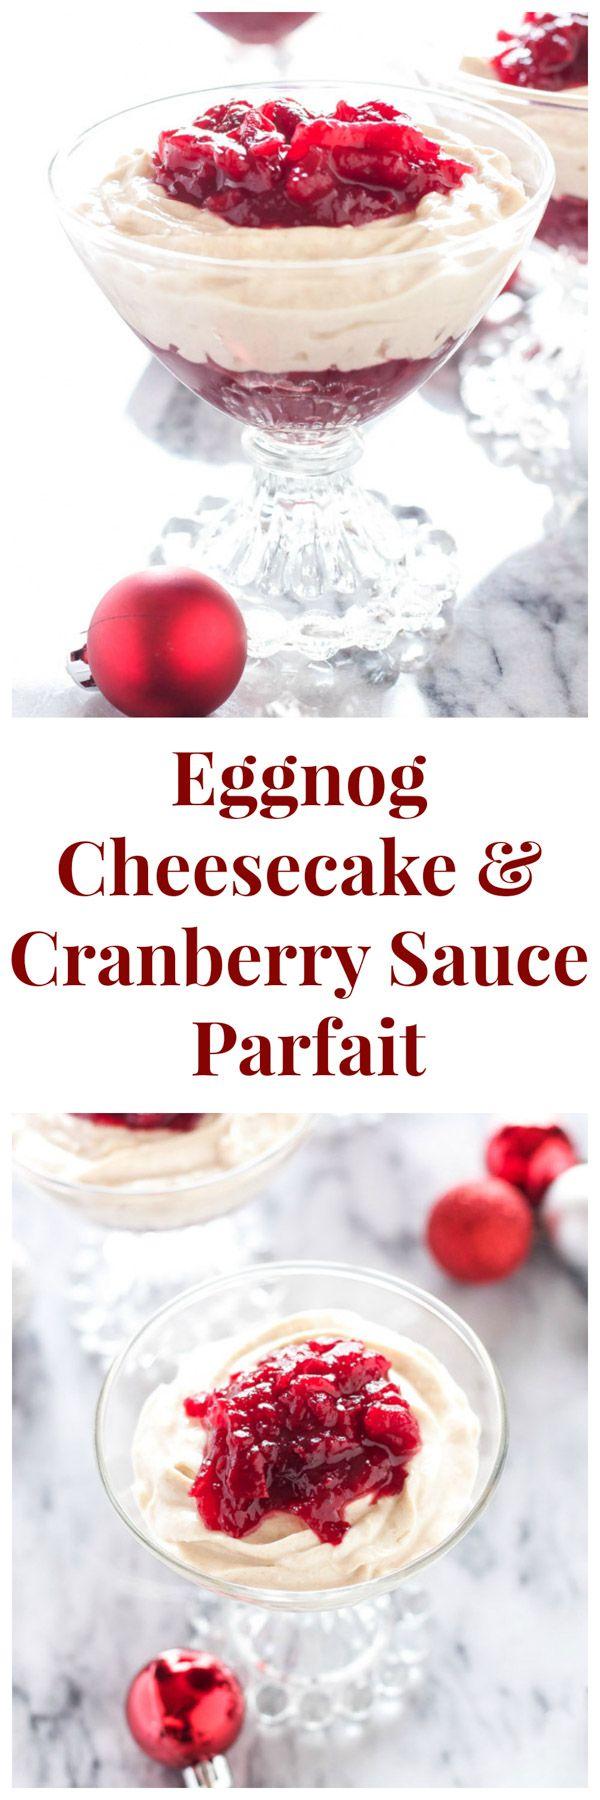 Eggnog Cheesecake and Cranberry Sauce Parfaits